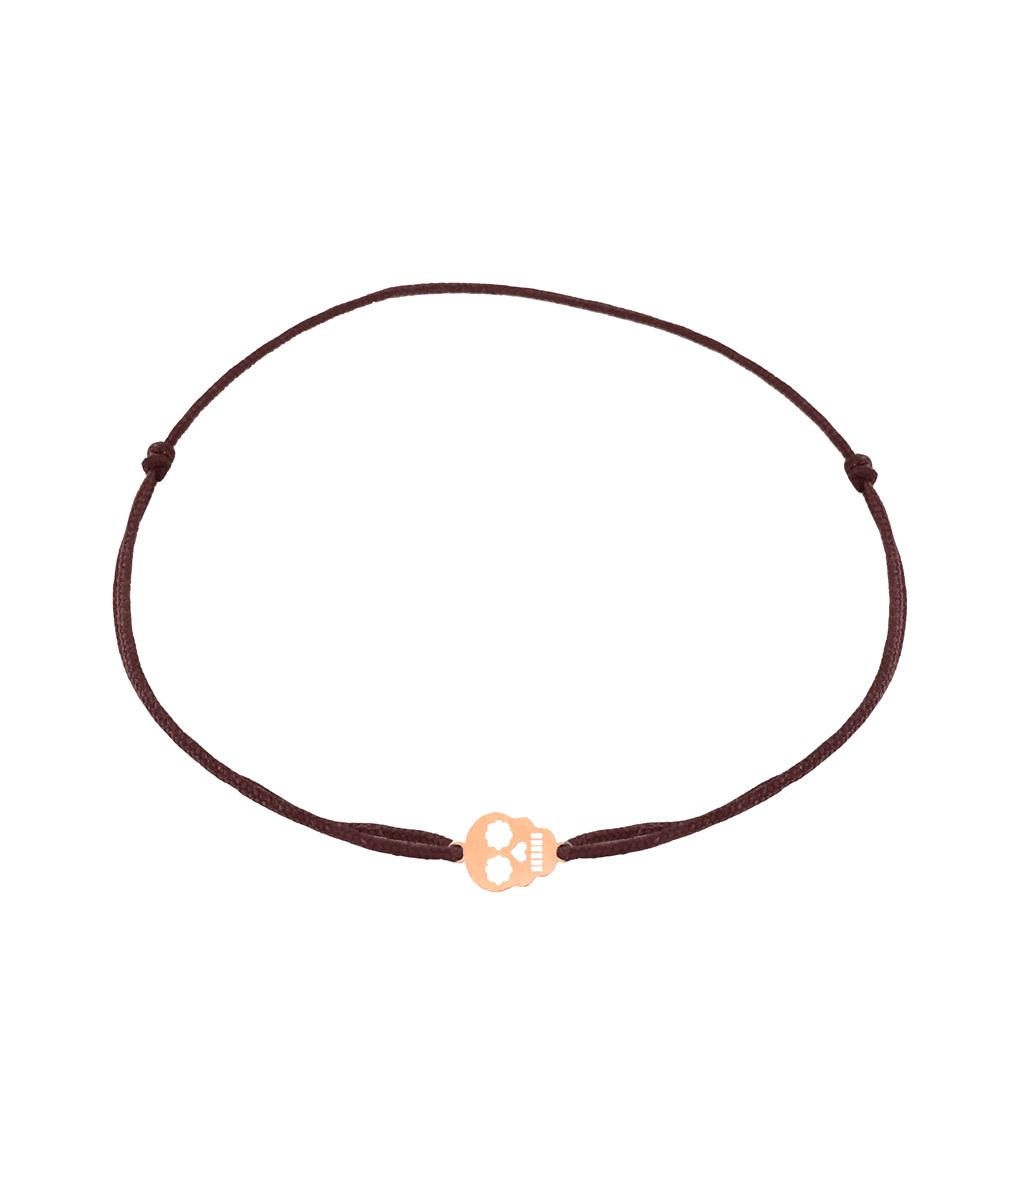 Bracelet Cordon La Catrina